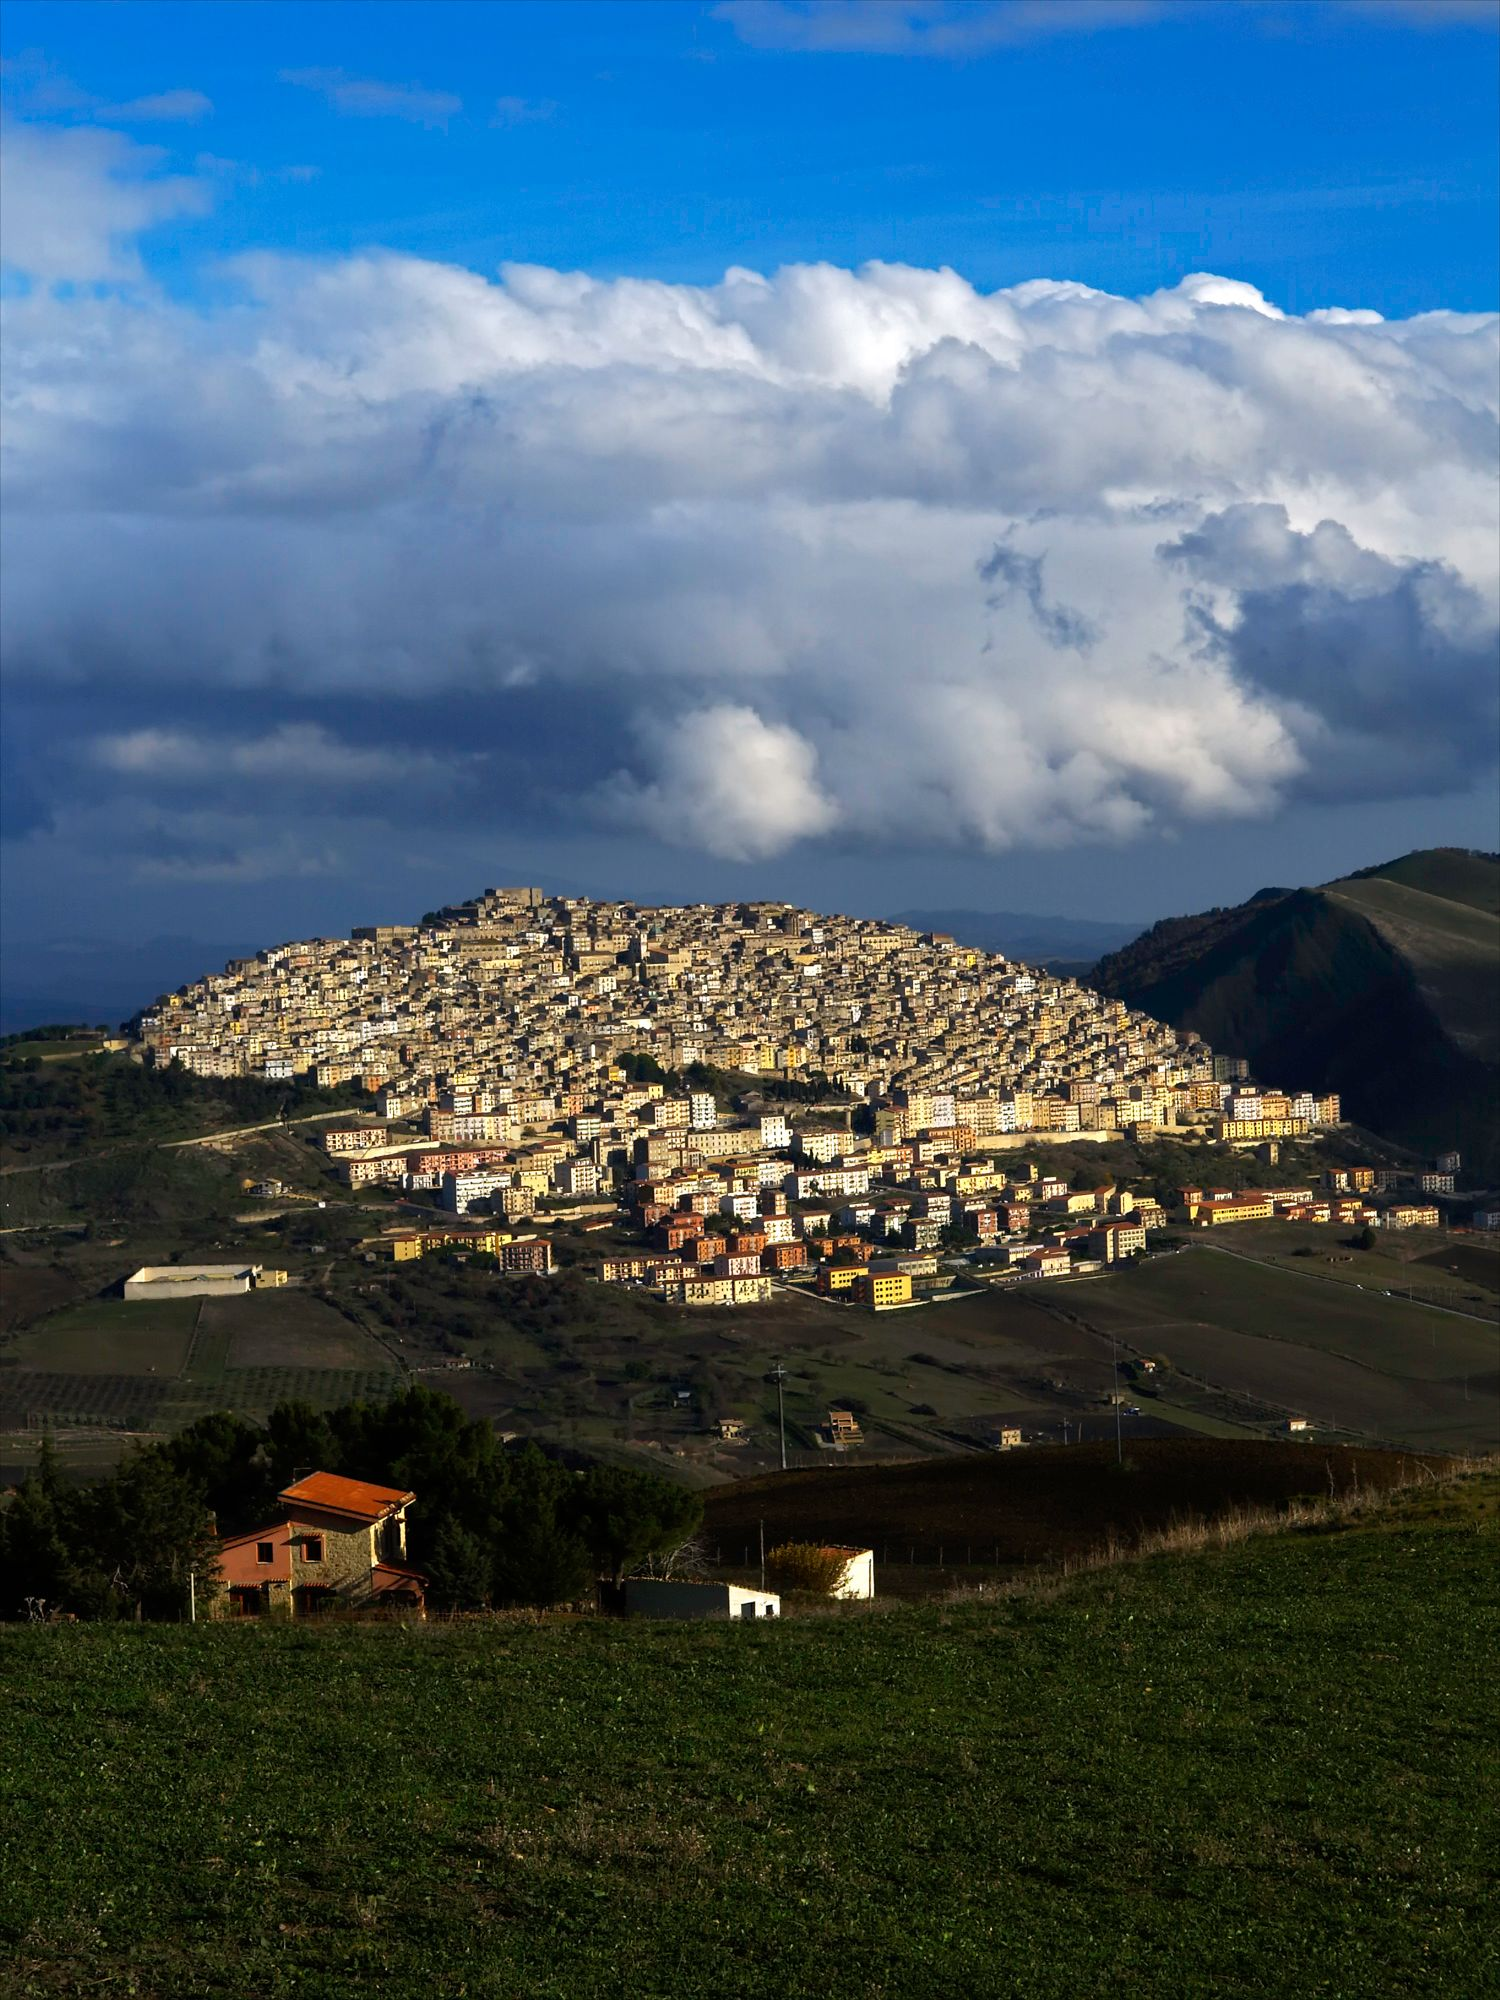 8-We Live Here-Gang, Italy.jpg